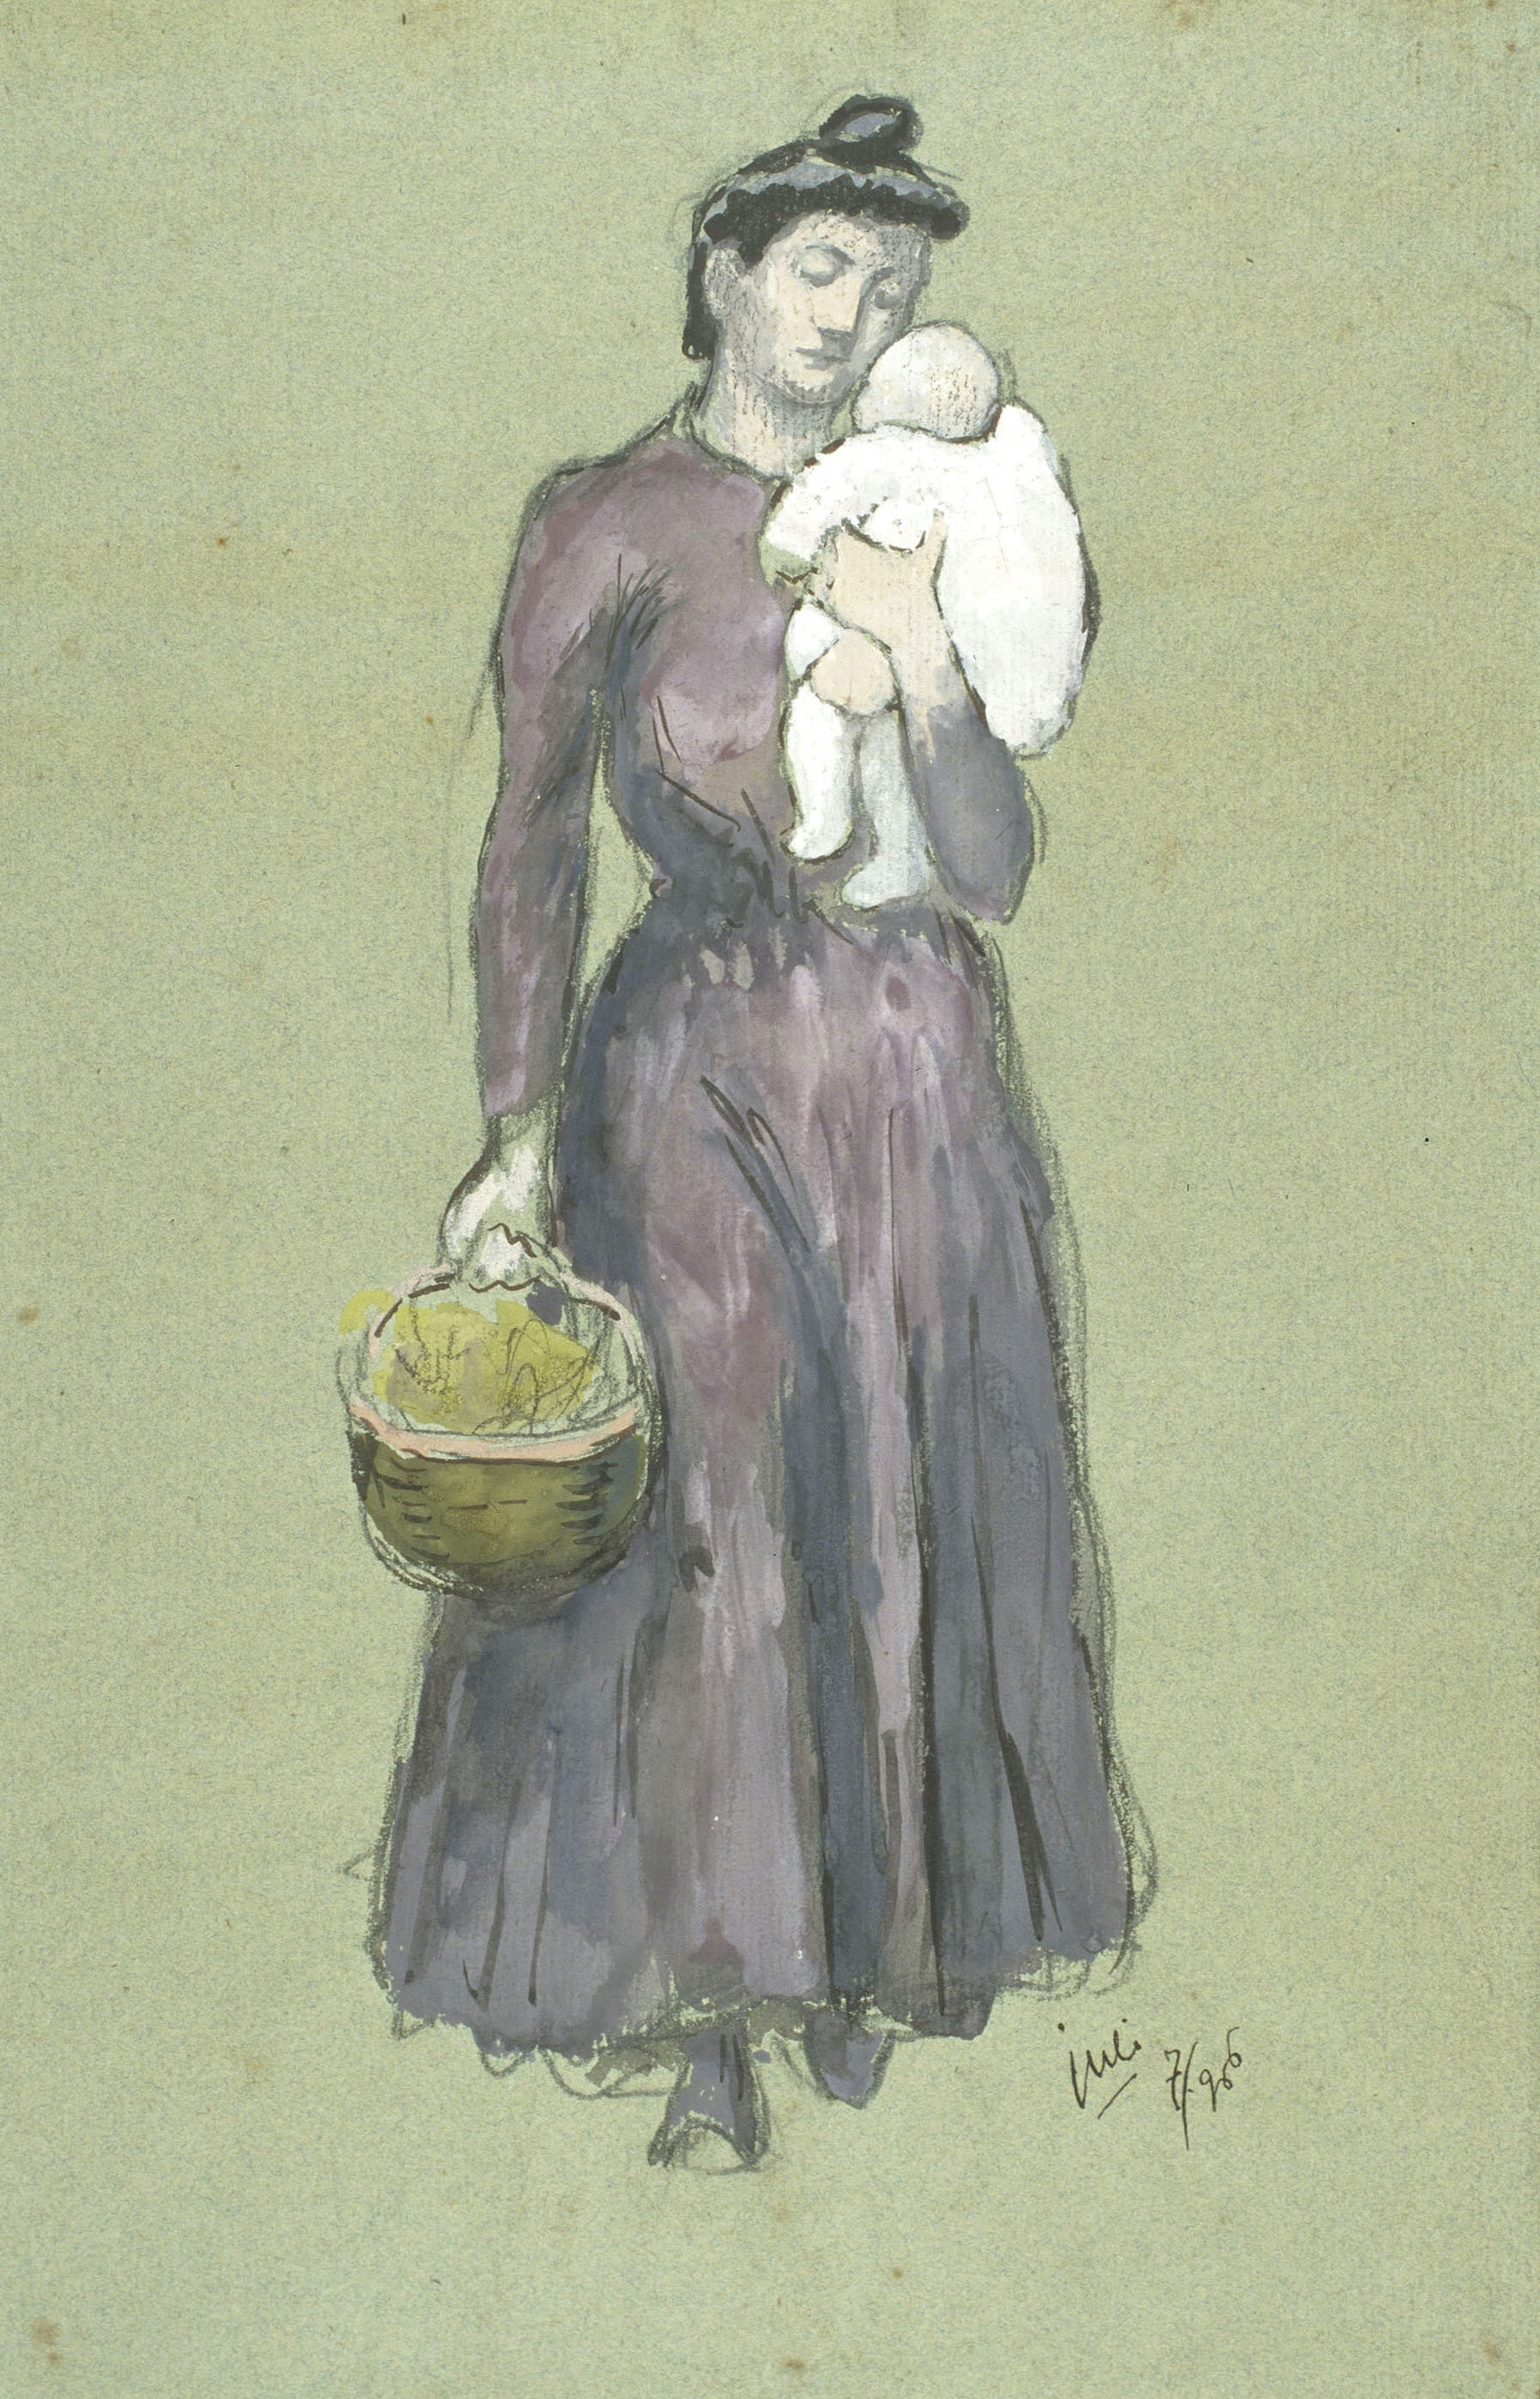 Juli González - Maternitat amb cistell (Maternité au panier) - 1906